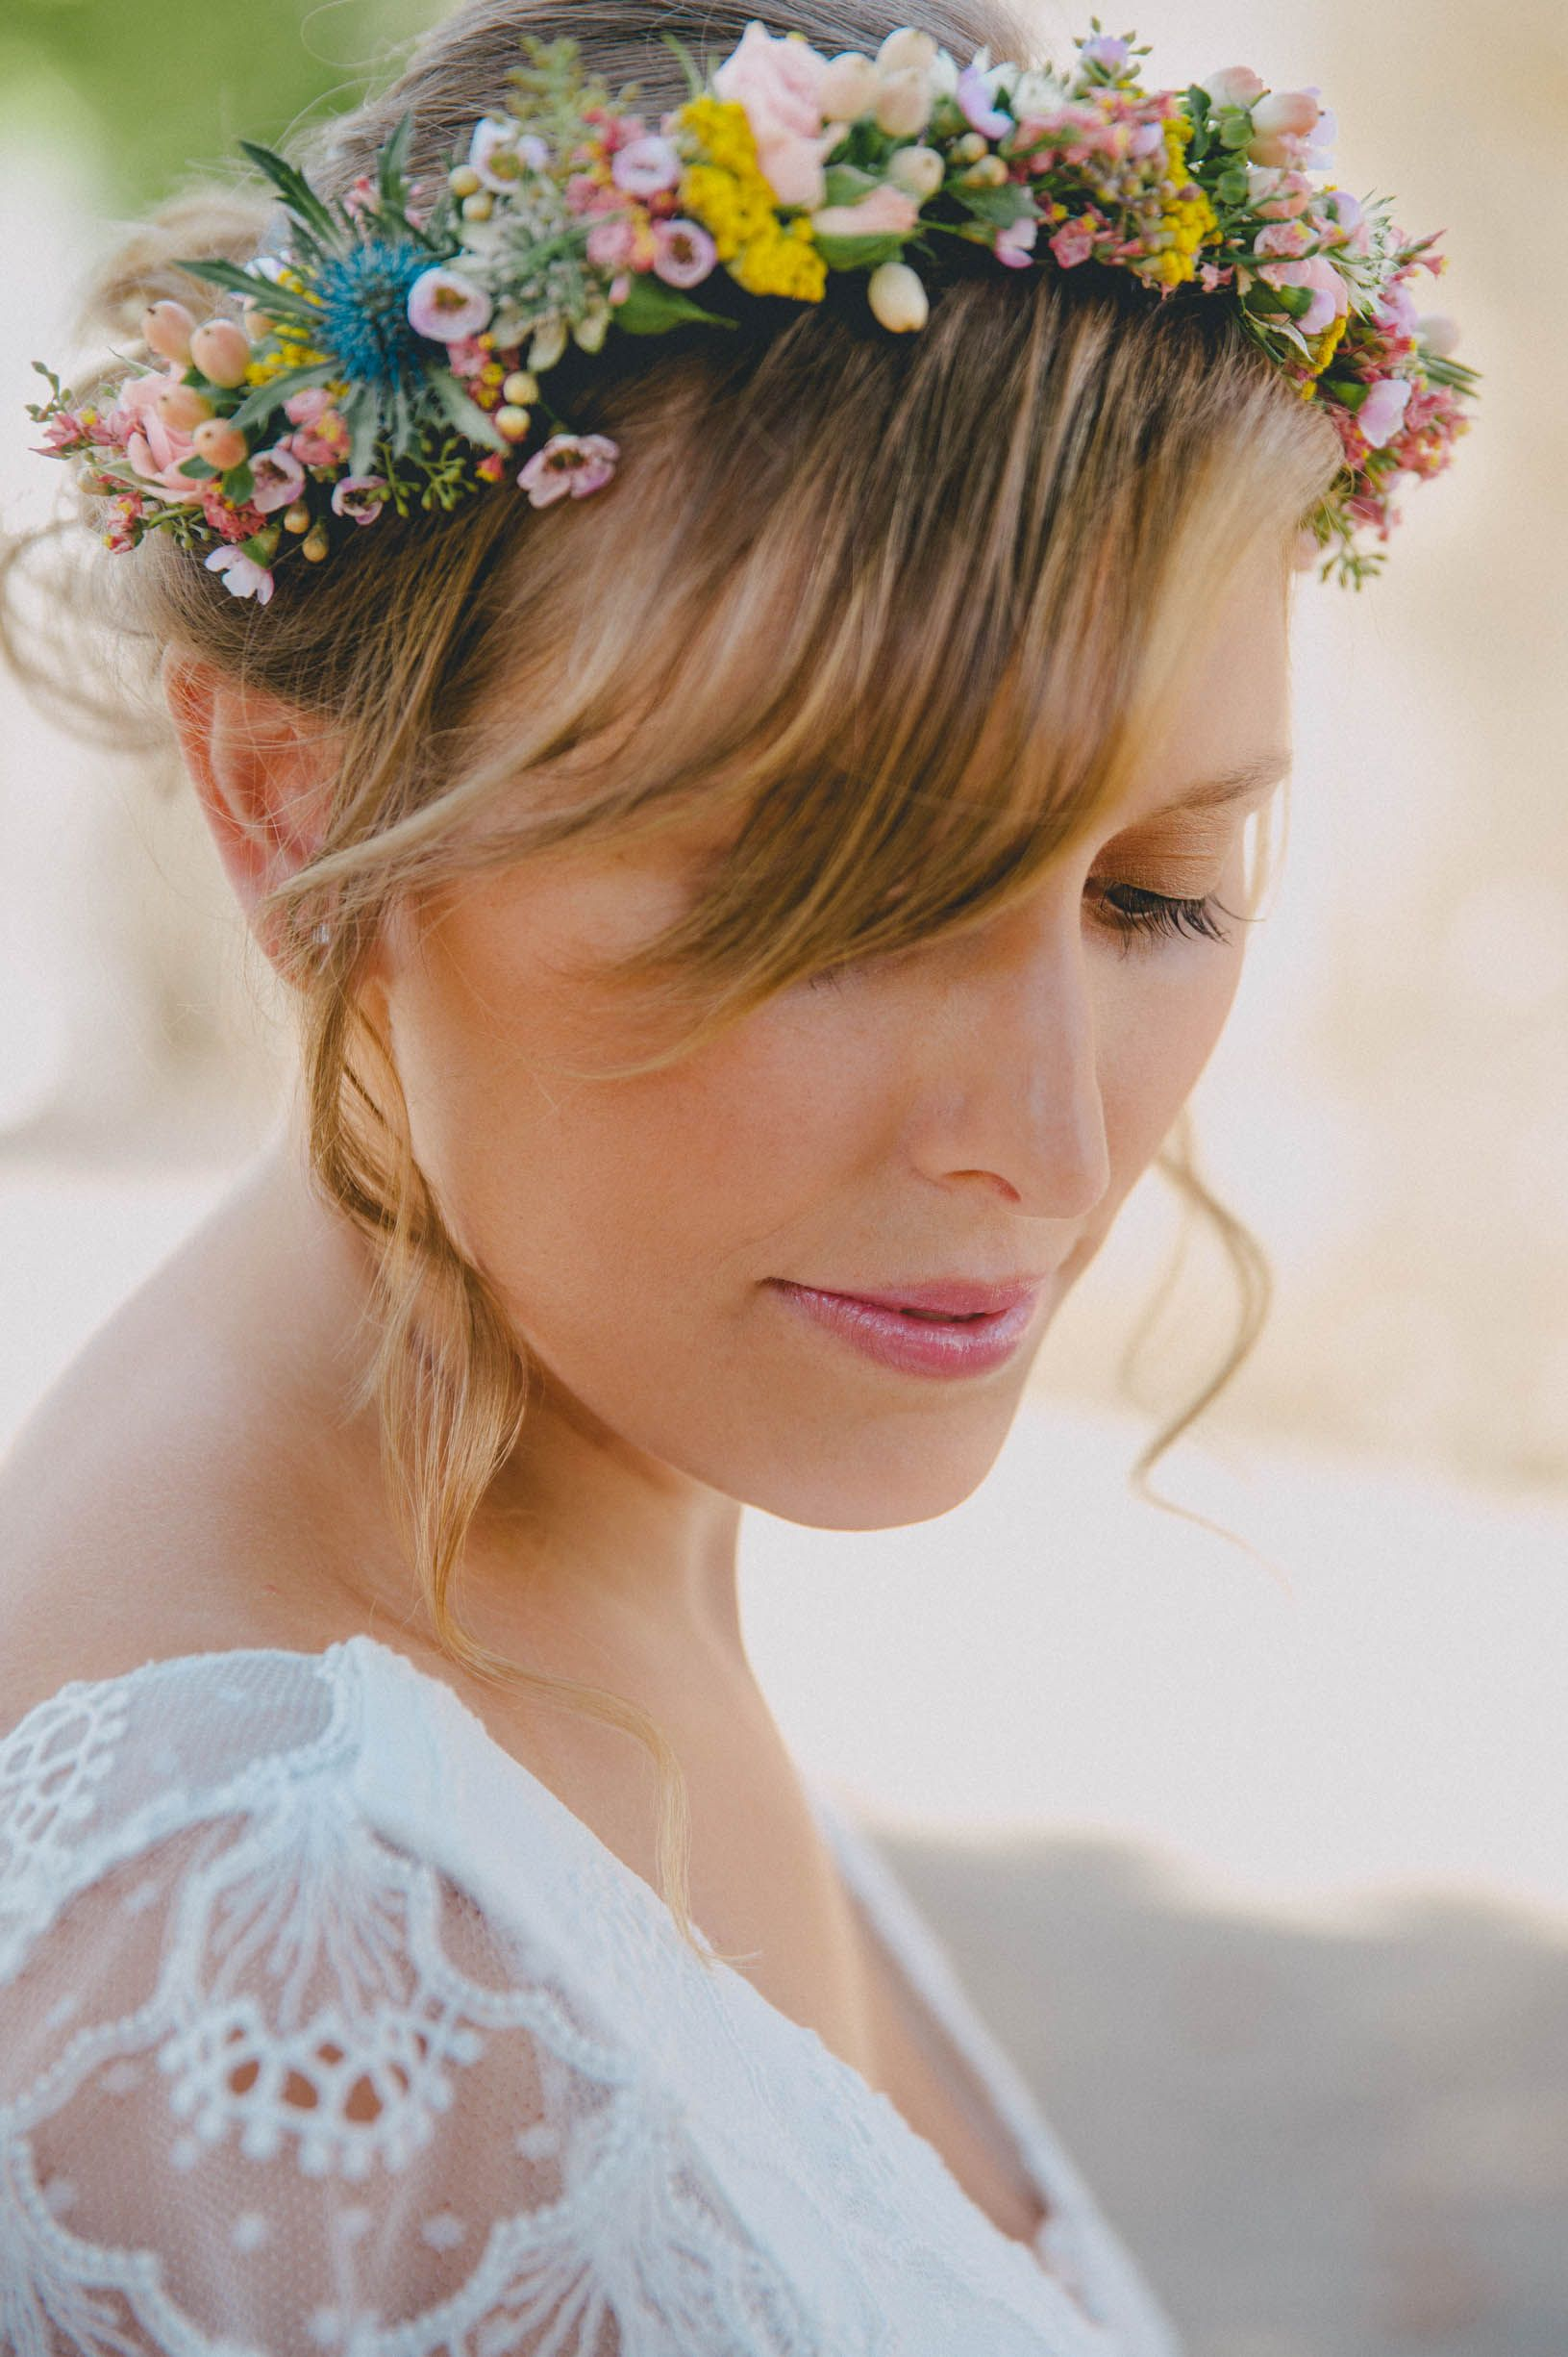 Photographe Mariage Bordeaux Mya Photography Wedding